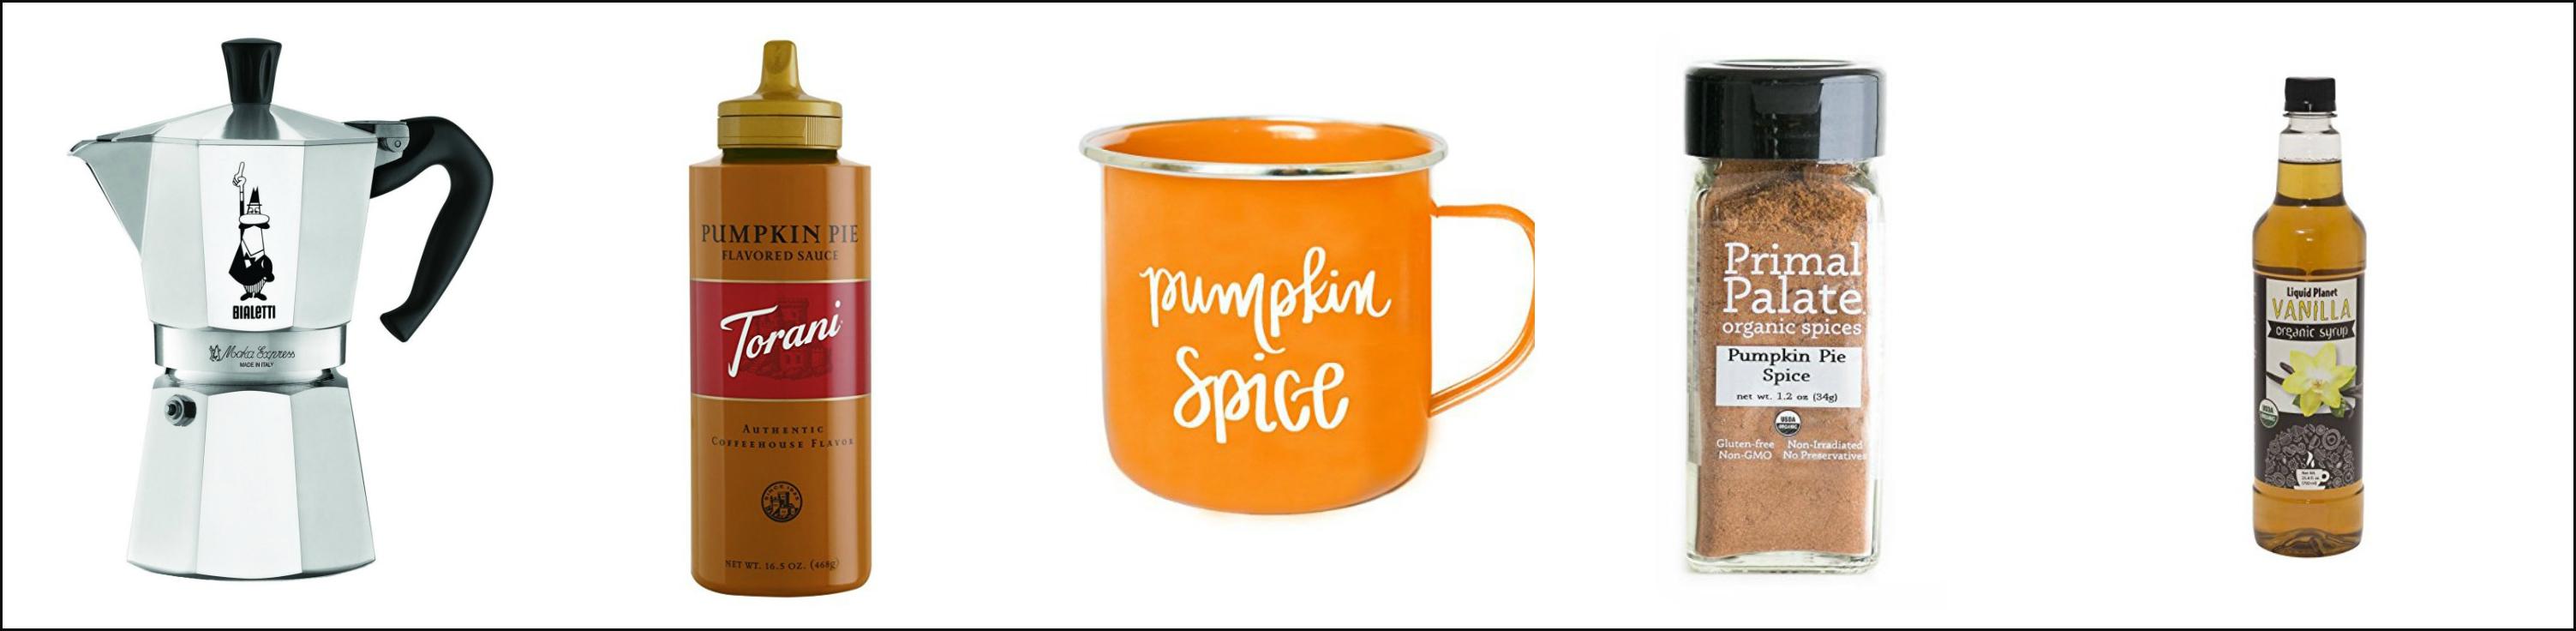 Starbucks Pumpkin Spice Latte at Home